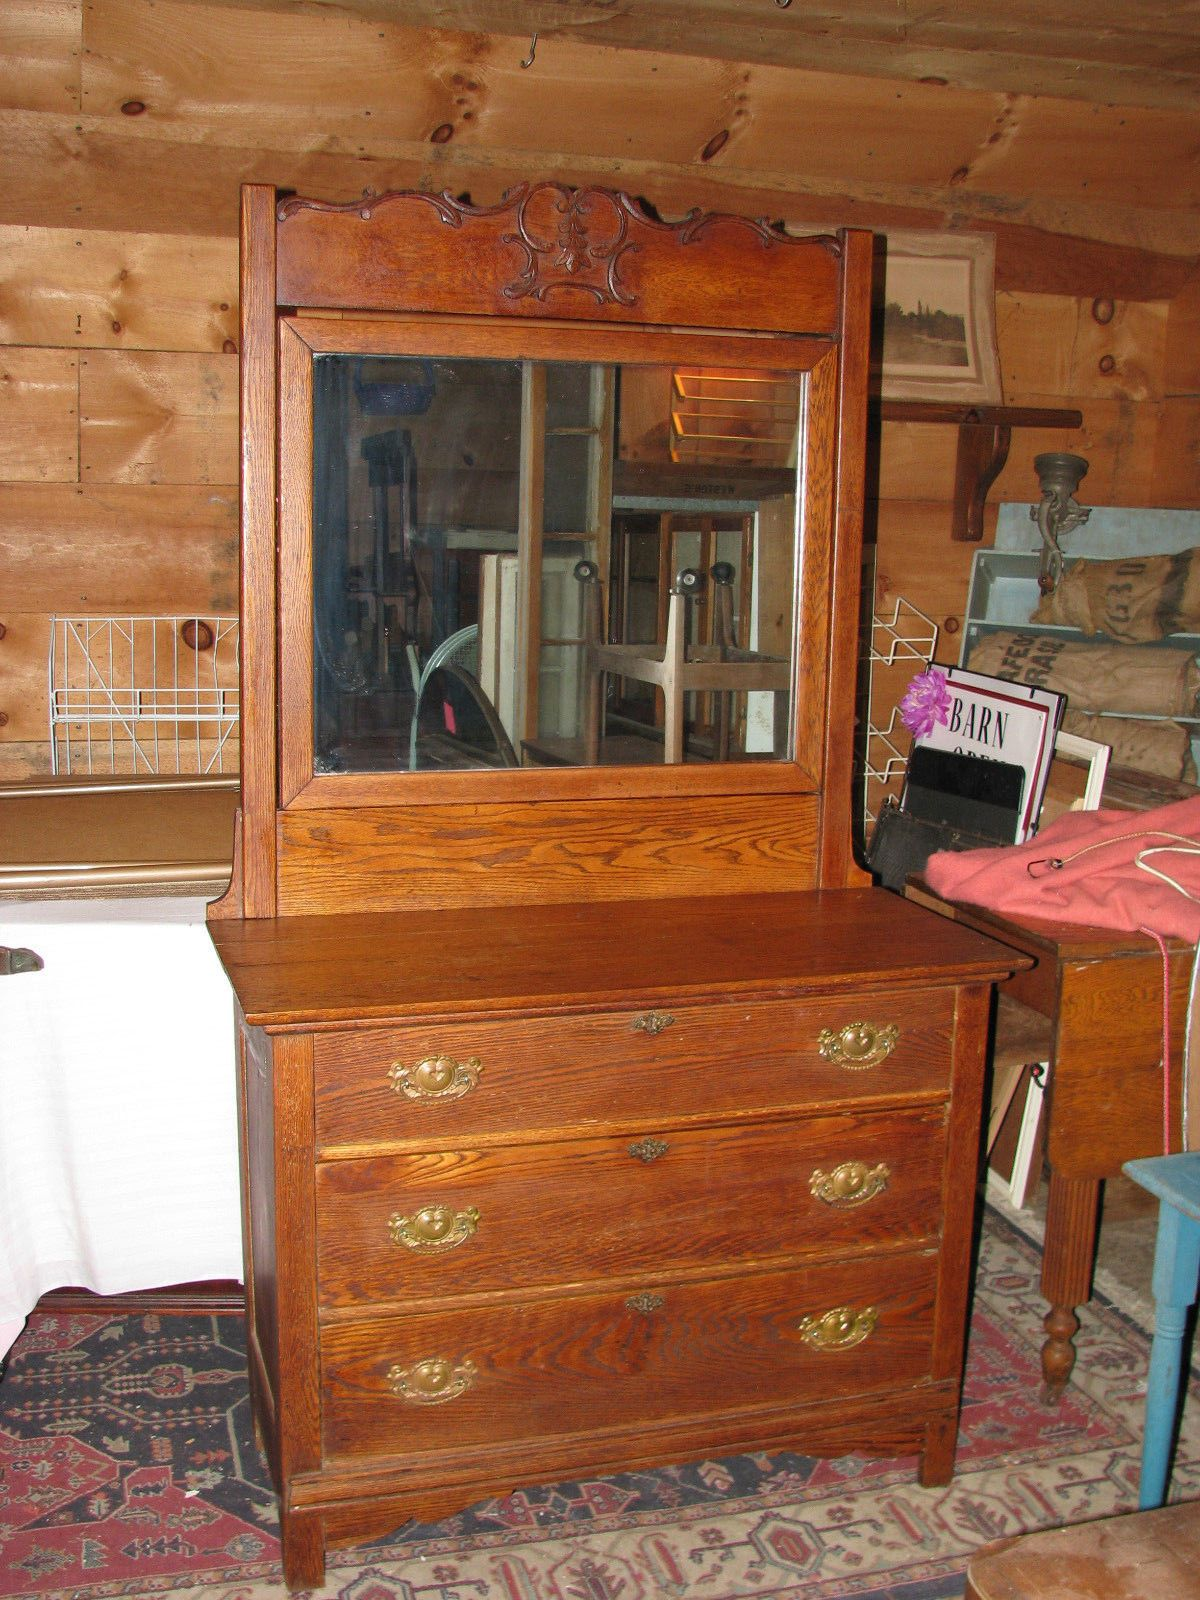 Lovely Antique Solid Oak Mirrored Bureau./Chest of Drawers https://t.co/jgShWKCHF7 https://t.co/W0JhaAytOF http://twitter.com/Foemvu_Maoxke/status/770829873636081664